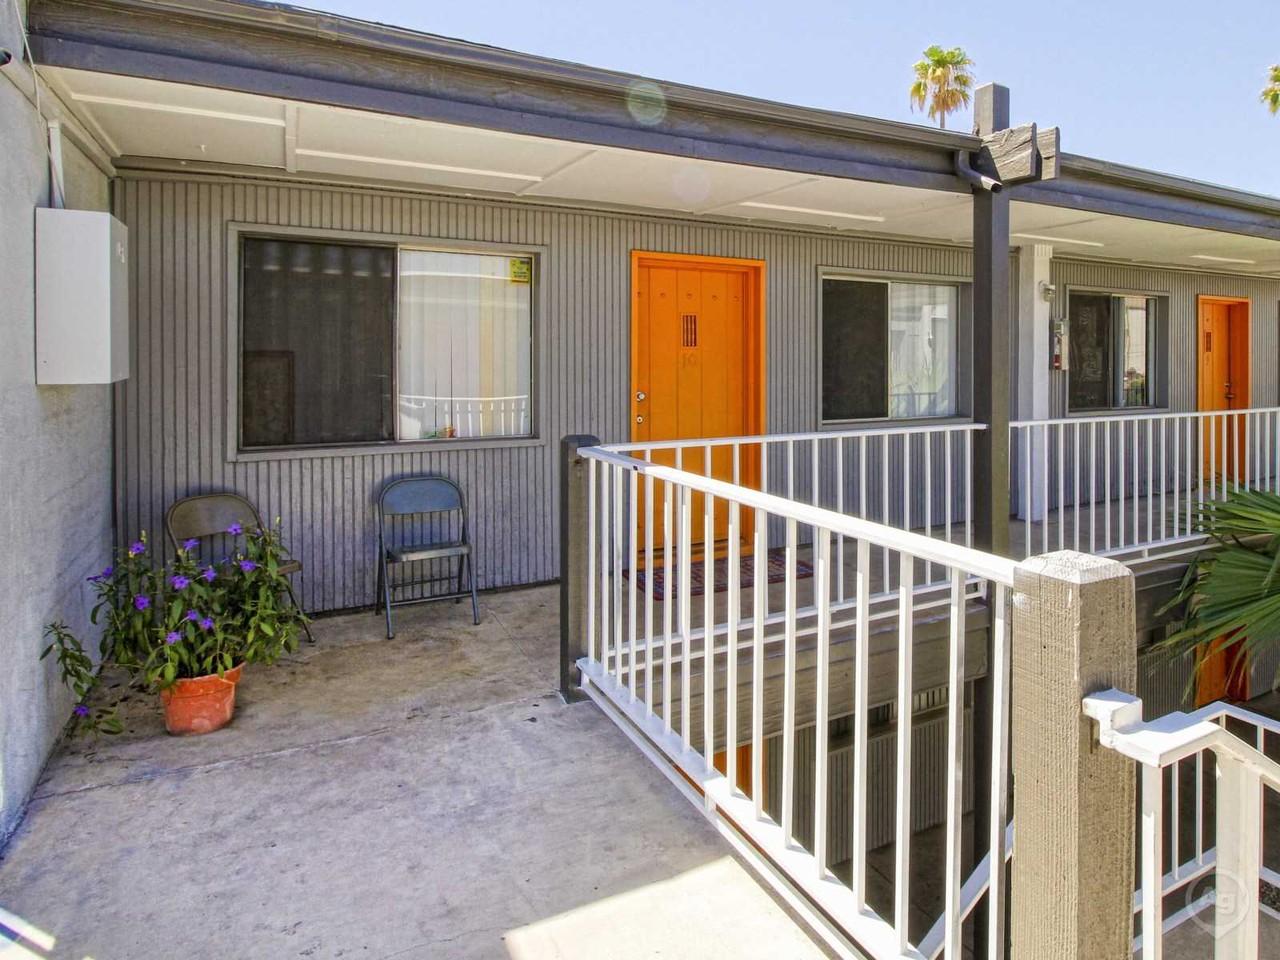 Canyon Club - 2525 W Pierson St, Phoenix, AZ 85017 - Apartment for ...